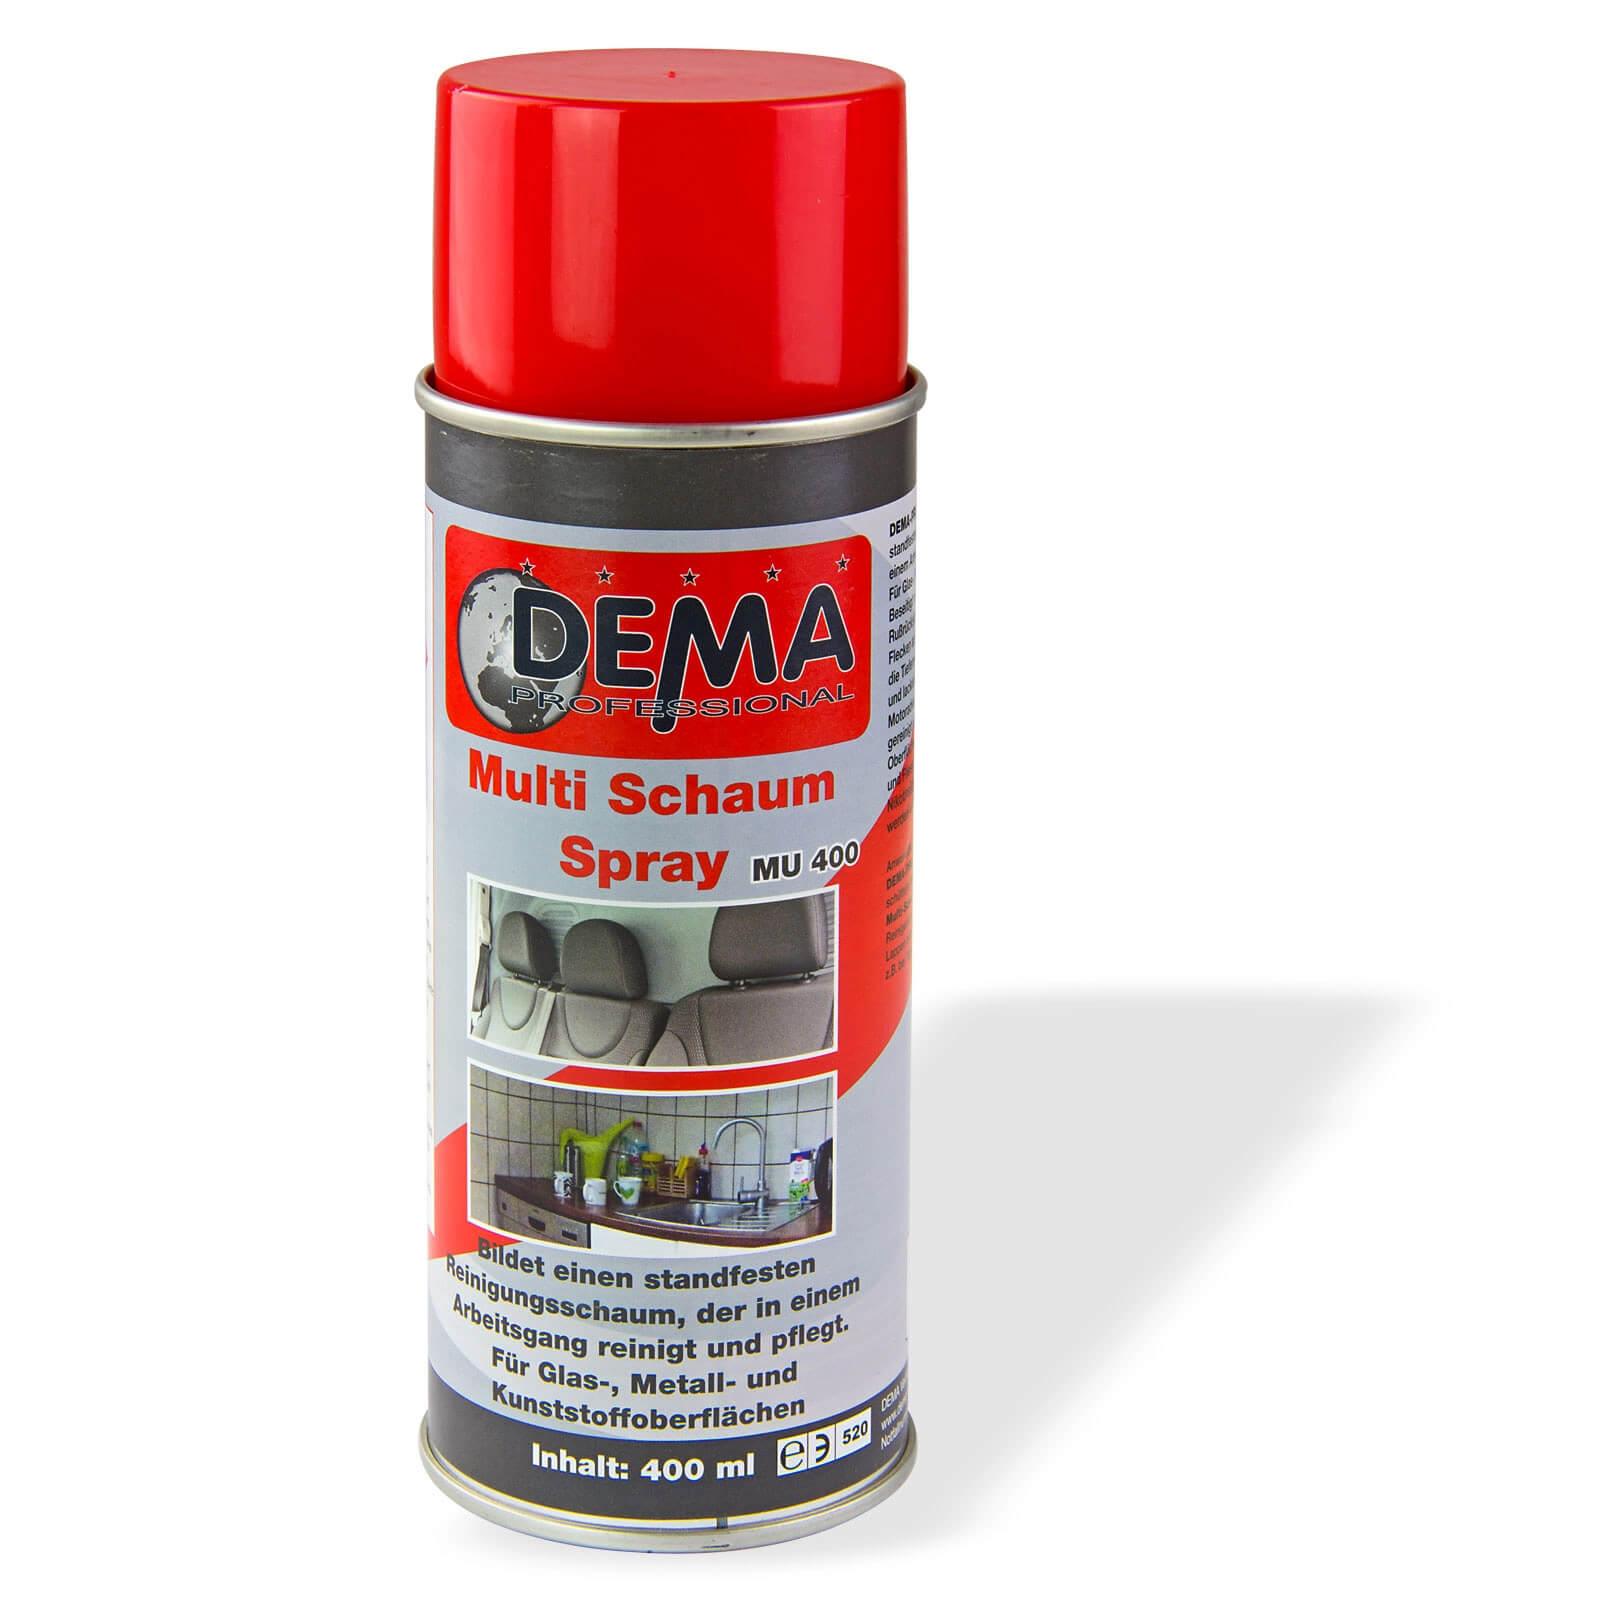 Dema Multi Schaum Spray PRO 400 ml 21096